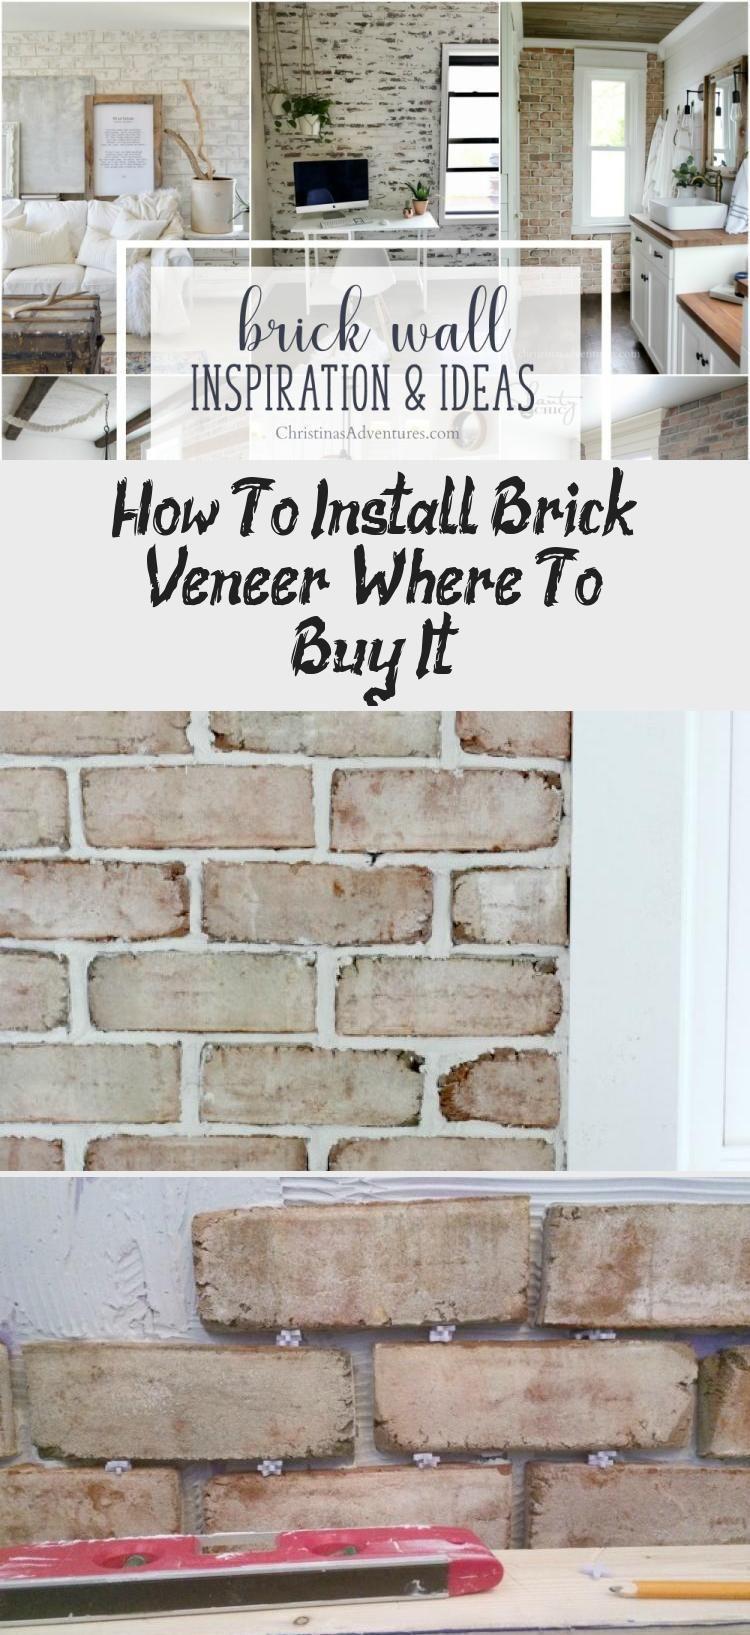 How To Install Brick Veneer Where